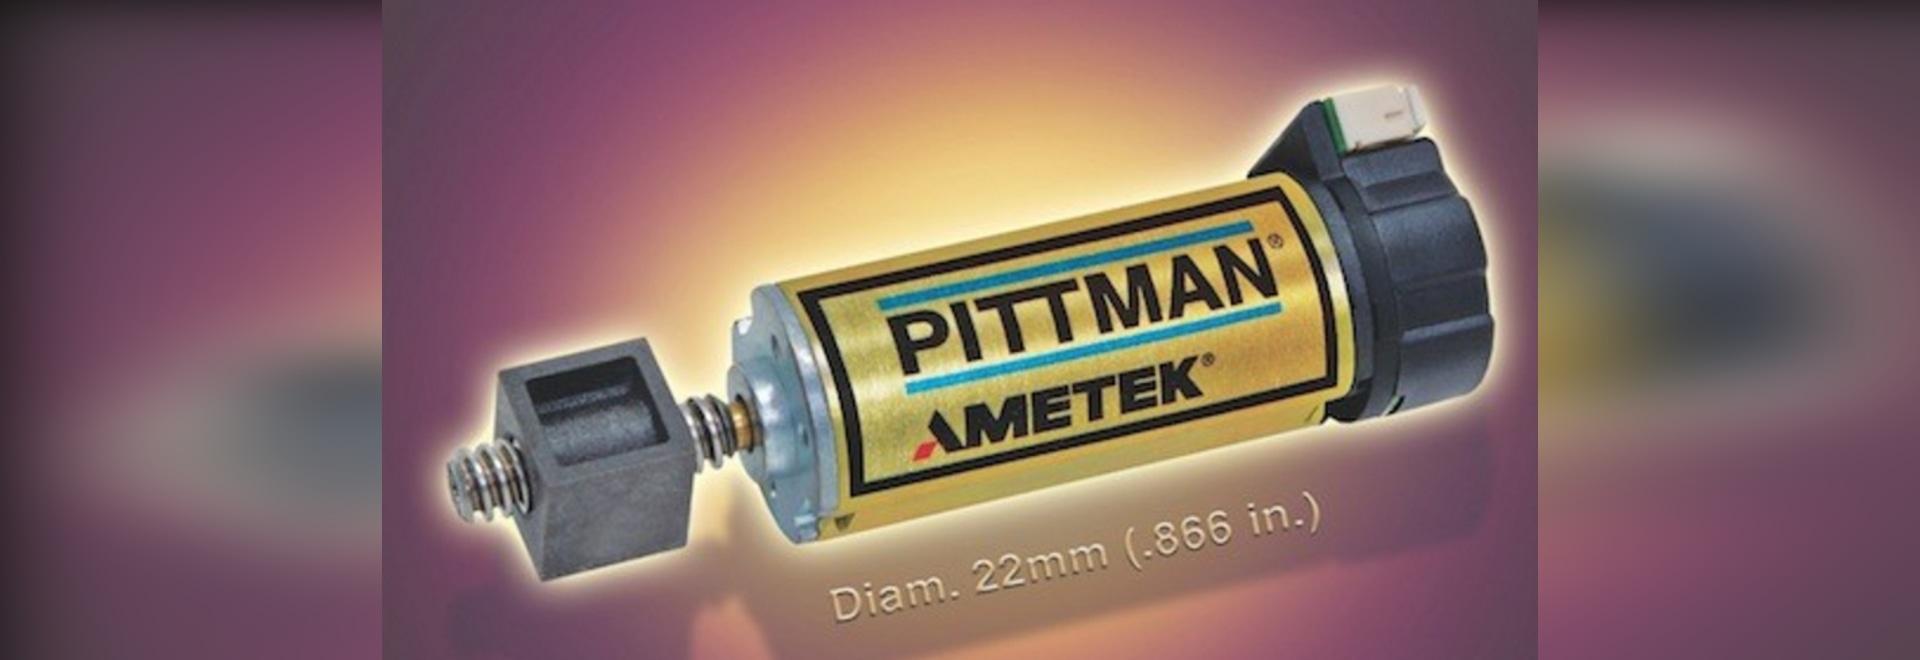 DC022C-Reihen bürsten DC-Motor durch Pittman-Motoren